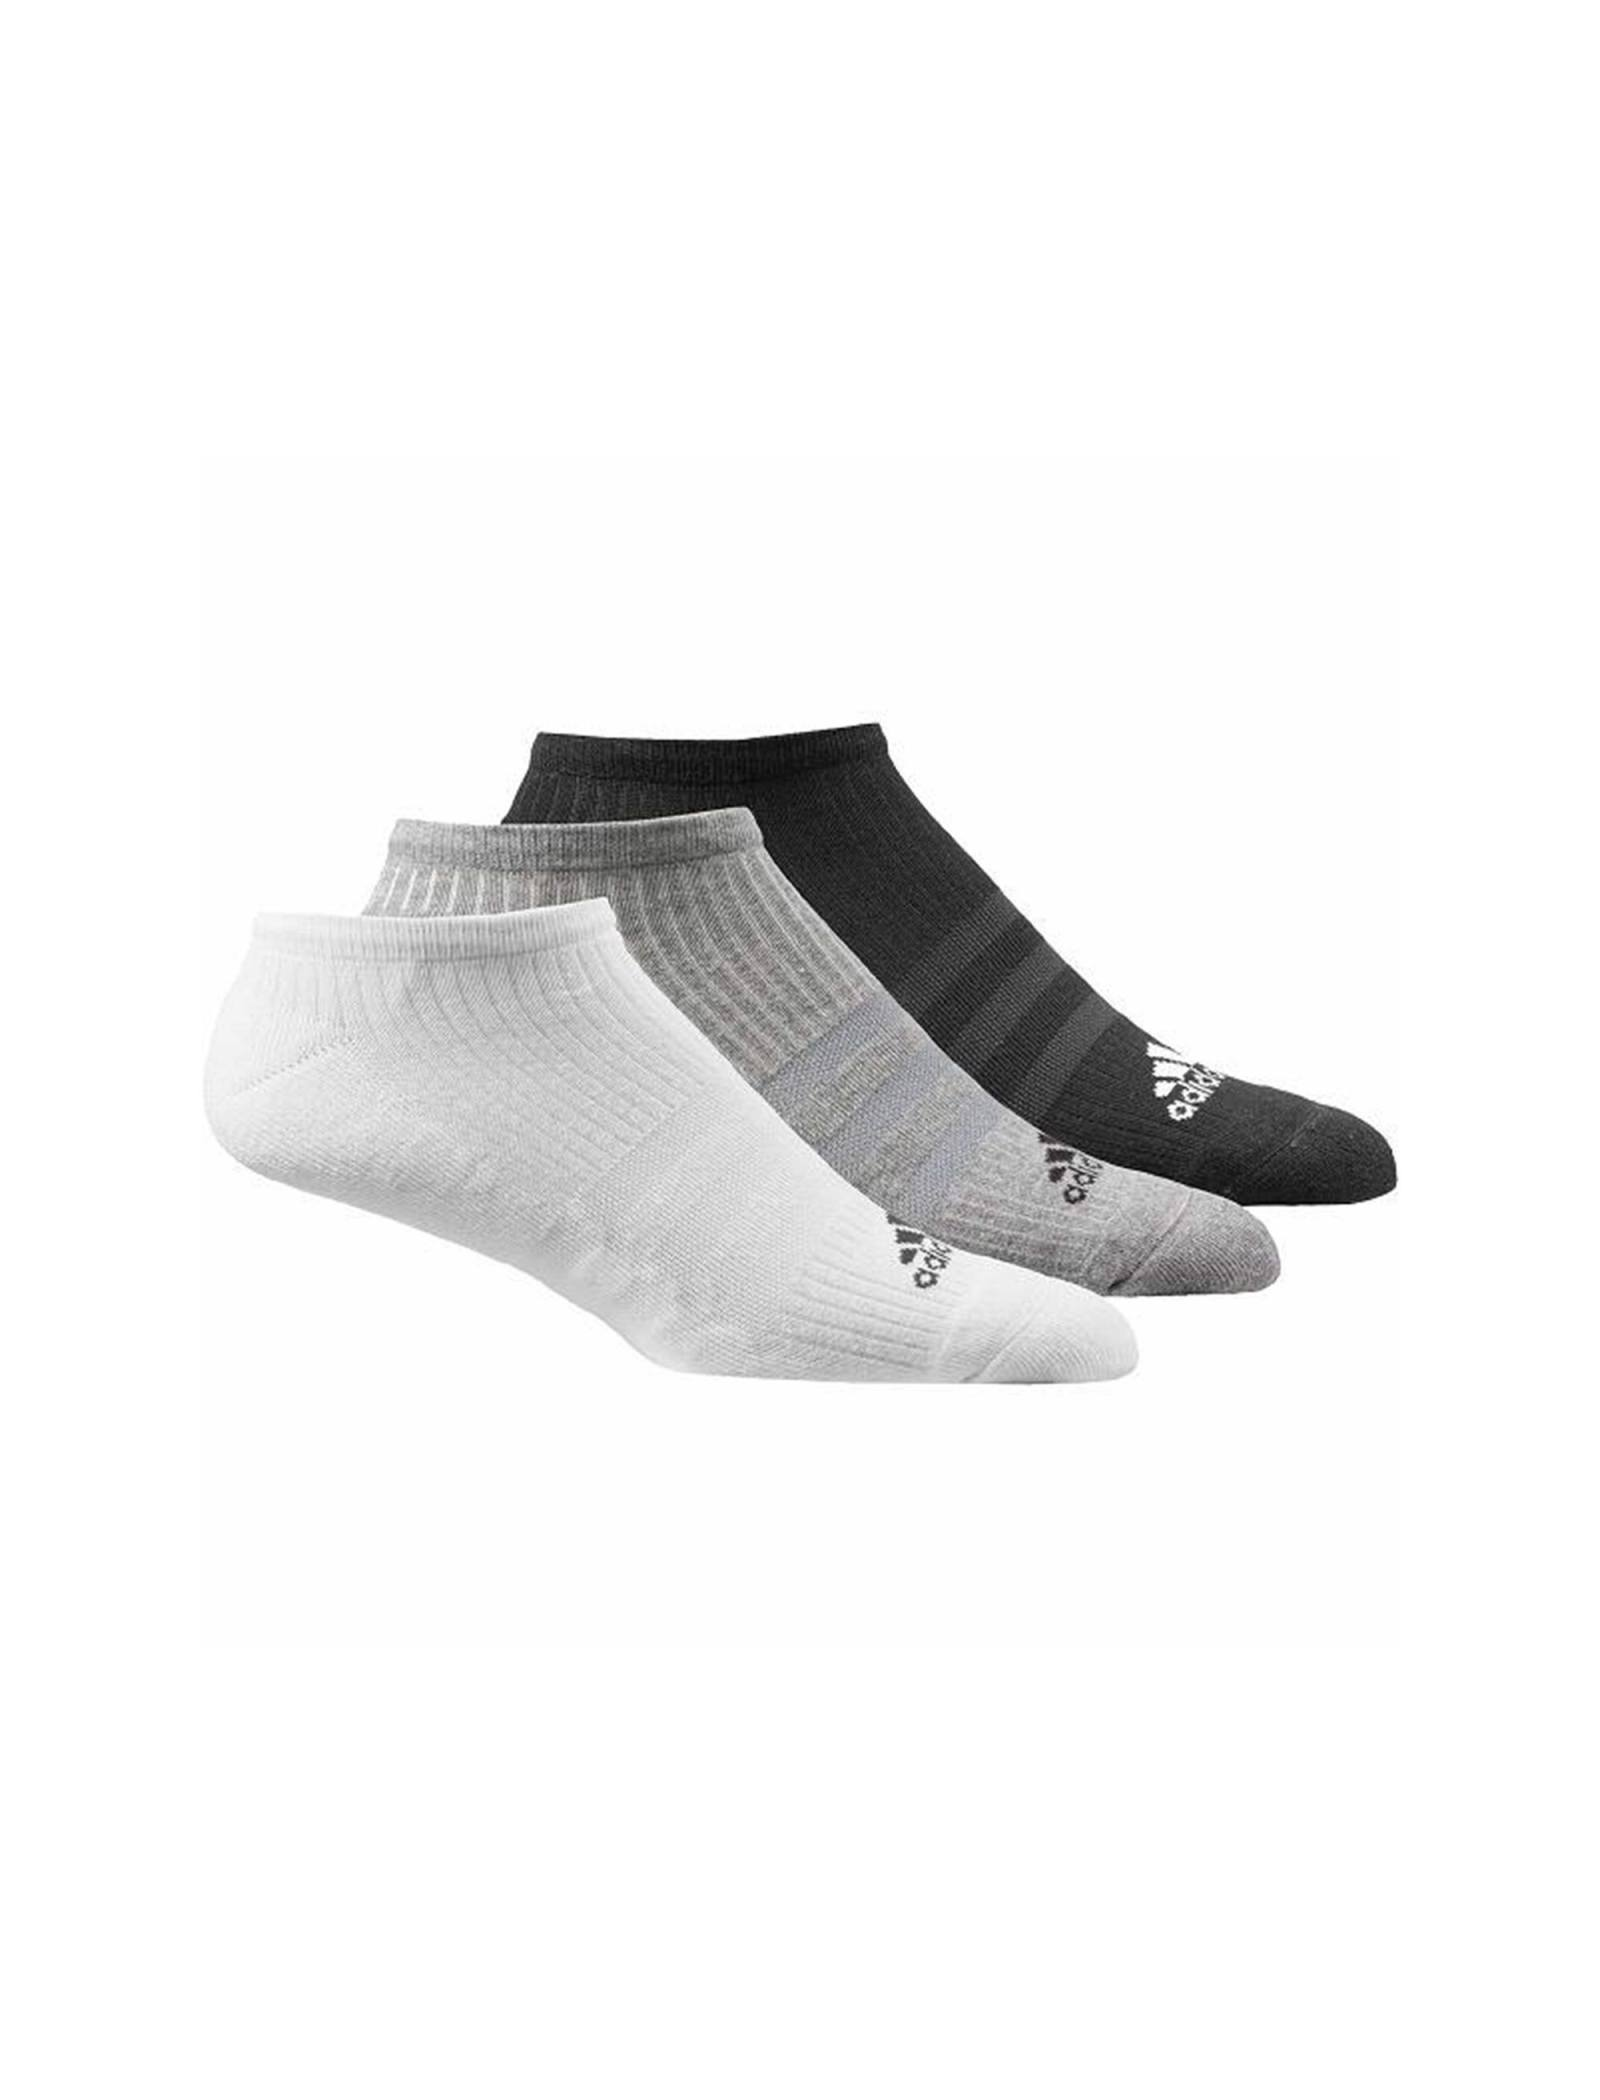 جوراب نخی بدون ساق بزرگسال بسته 3 عددی - آدیداس - طوسي/مشکي/سفيد - 1